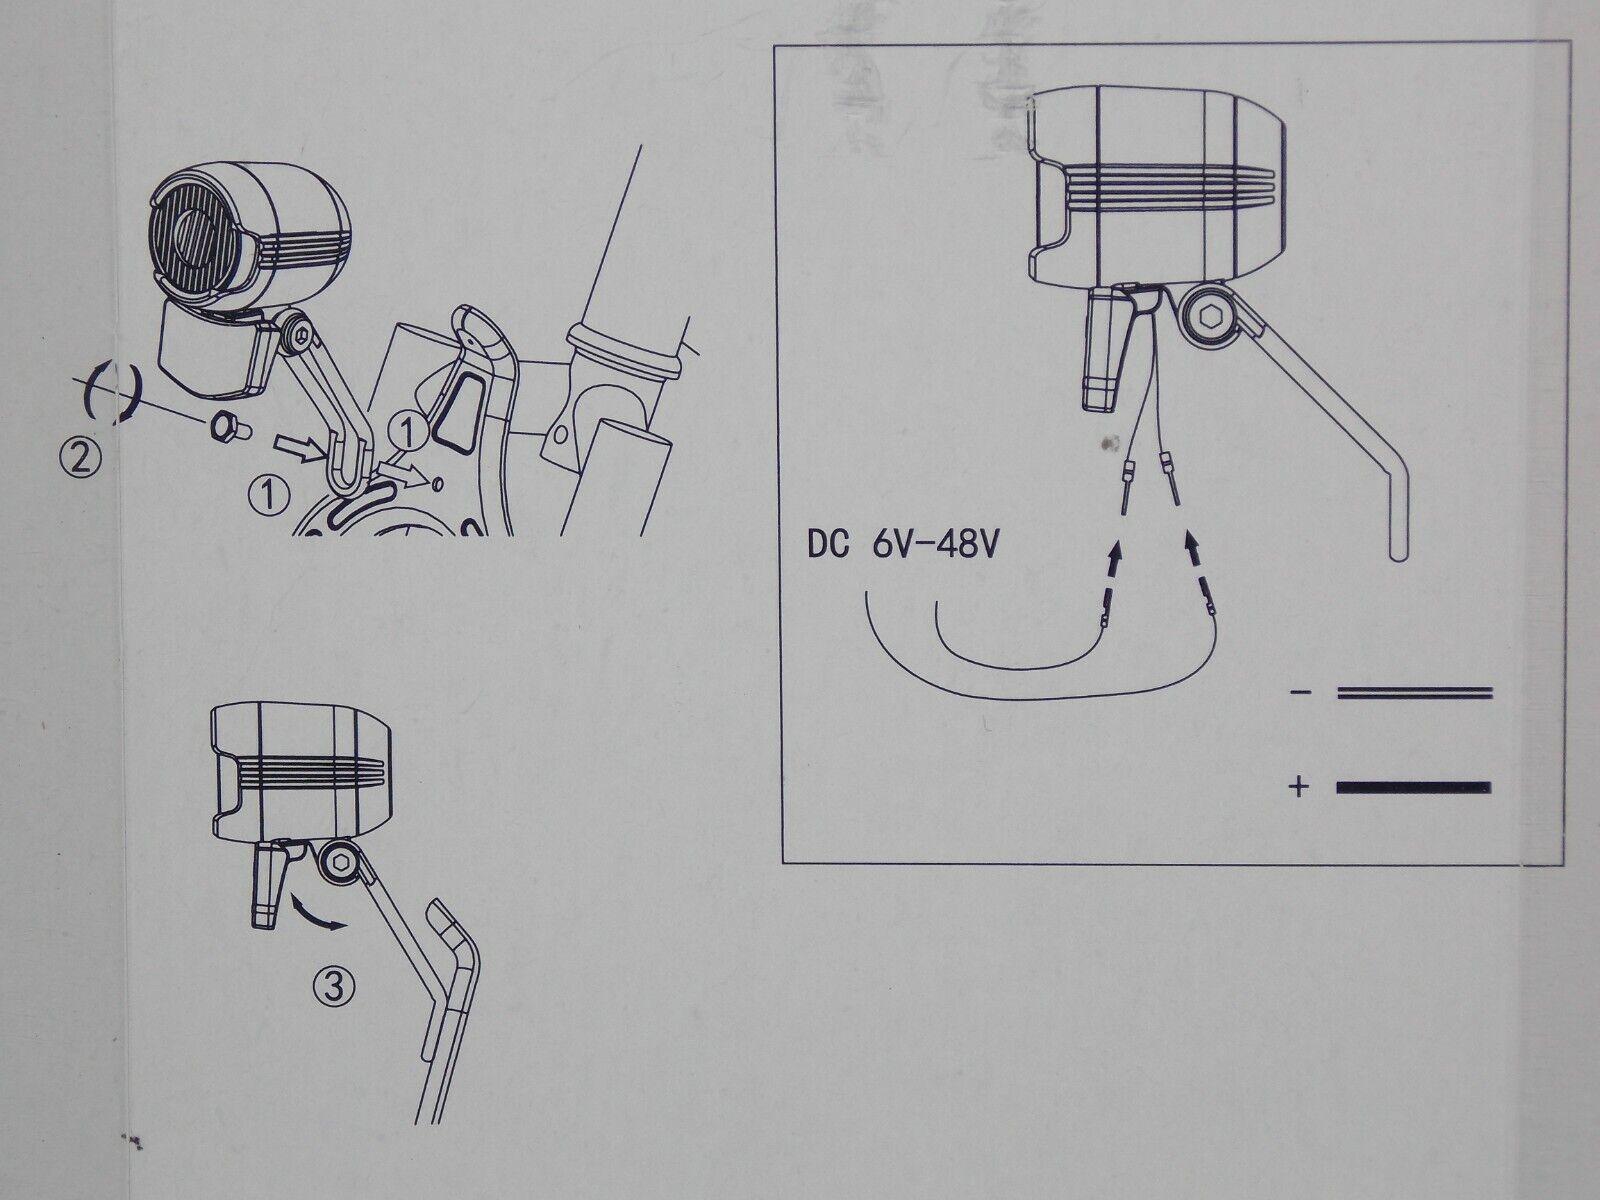 ⭐2020 FalkX LED E-Bike Beleuchtung Set 6V-48V HighP Scheinwerfer 40LM*Rücklicht⭐